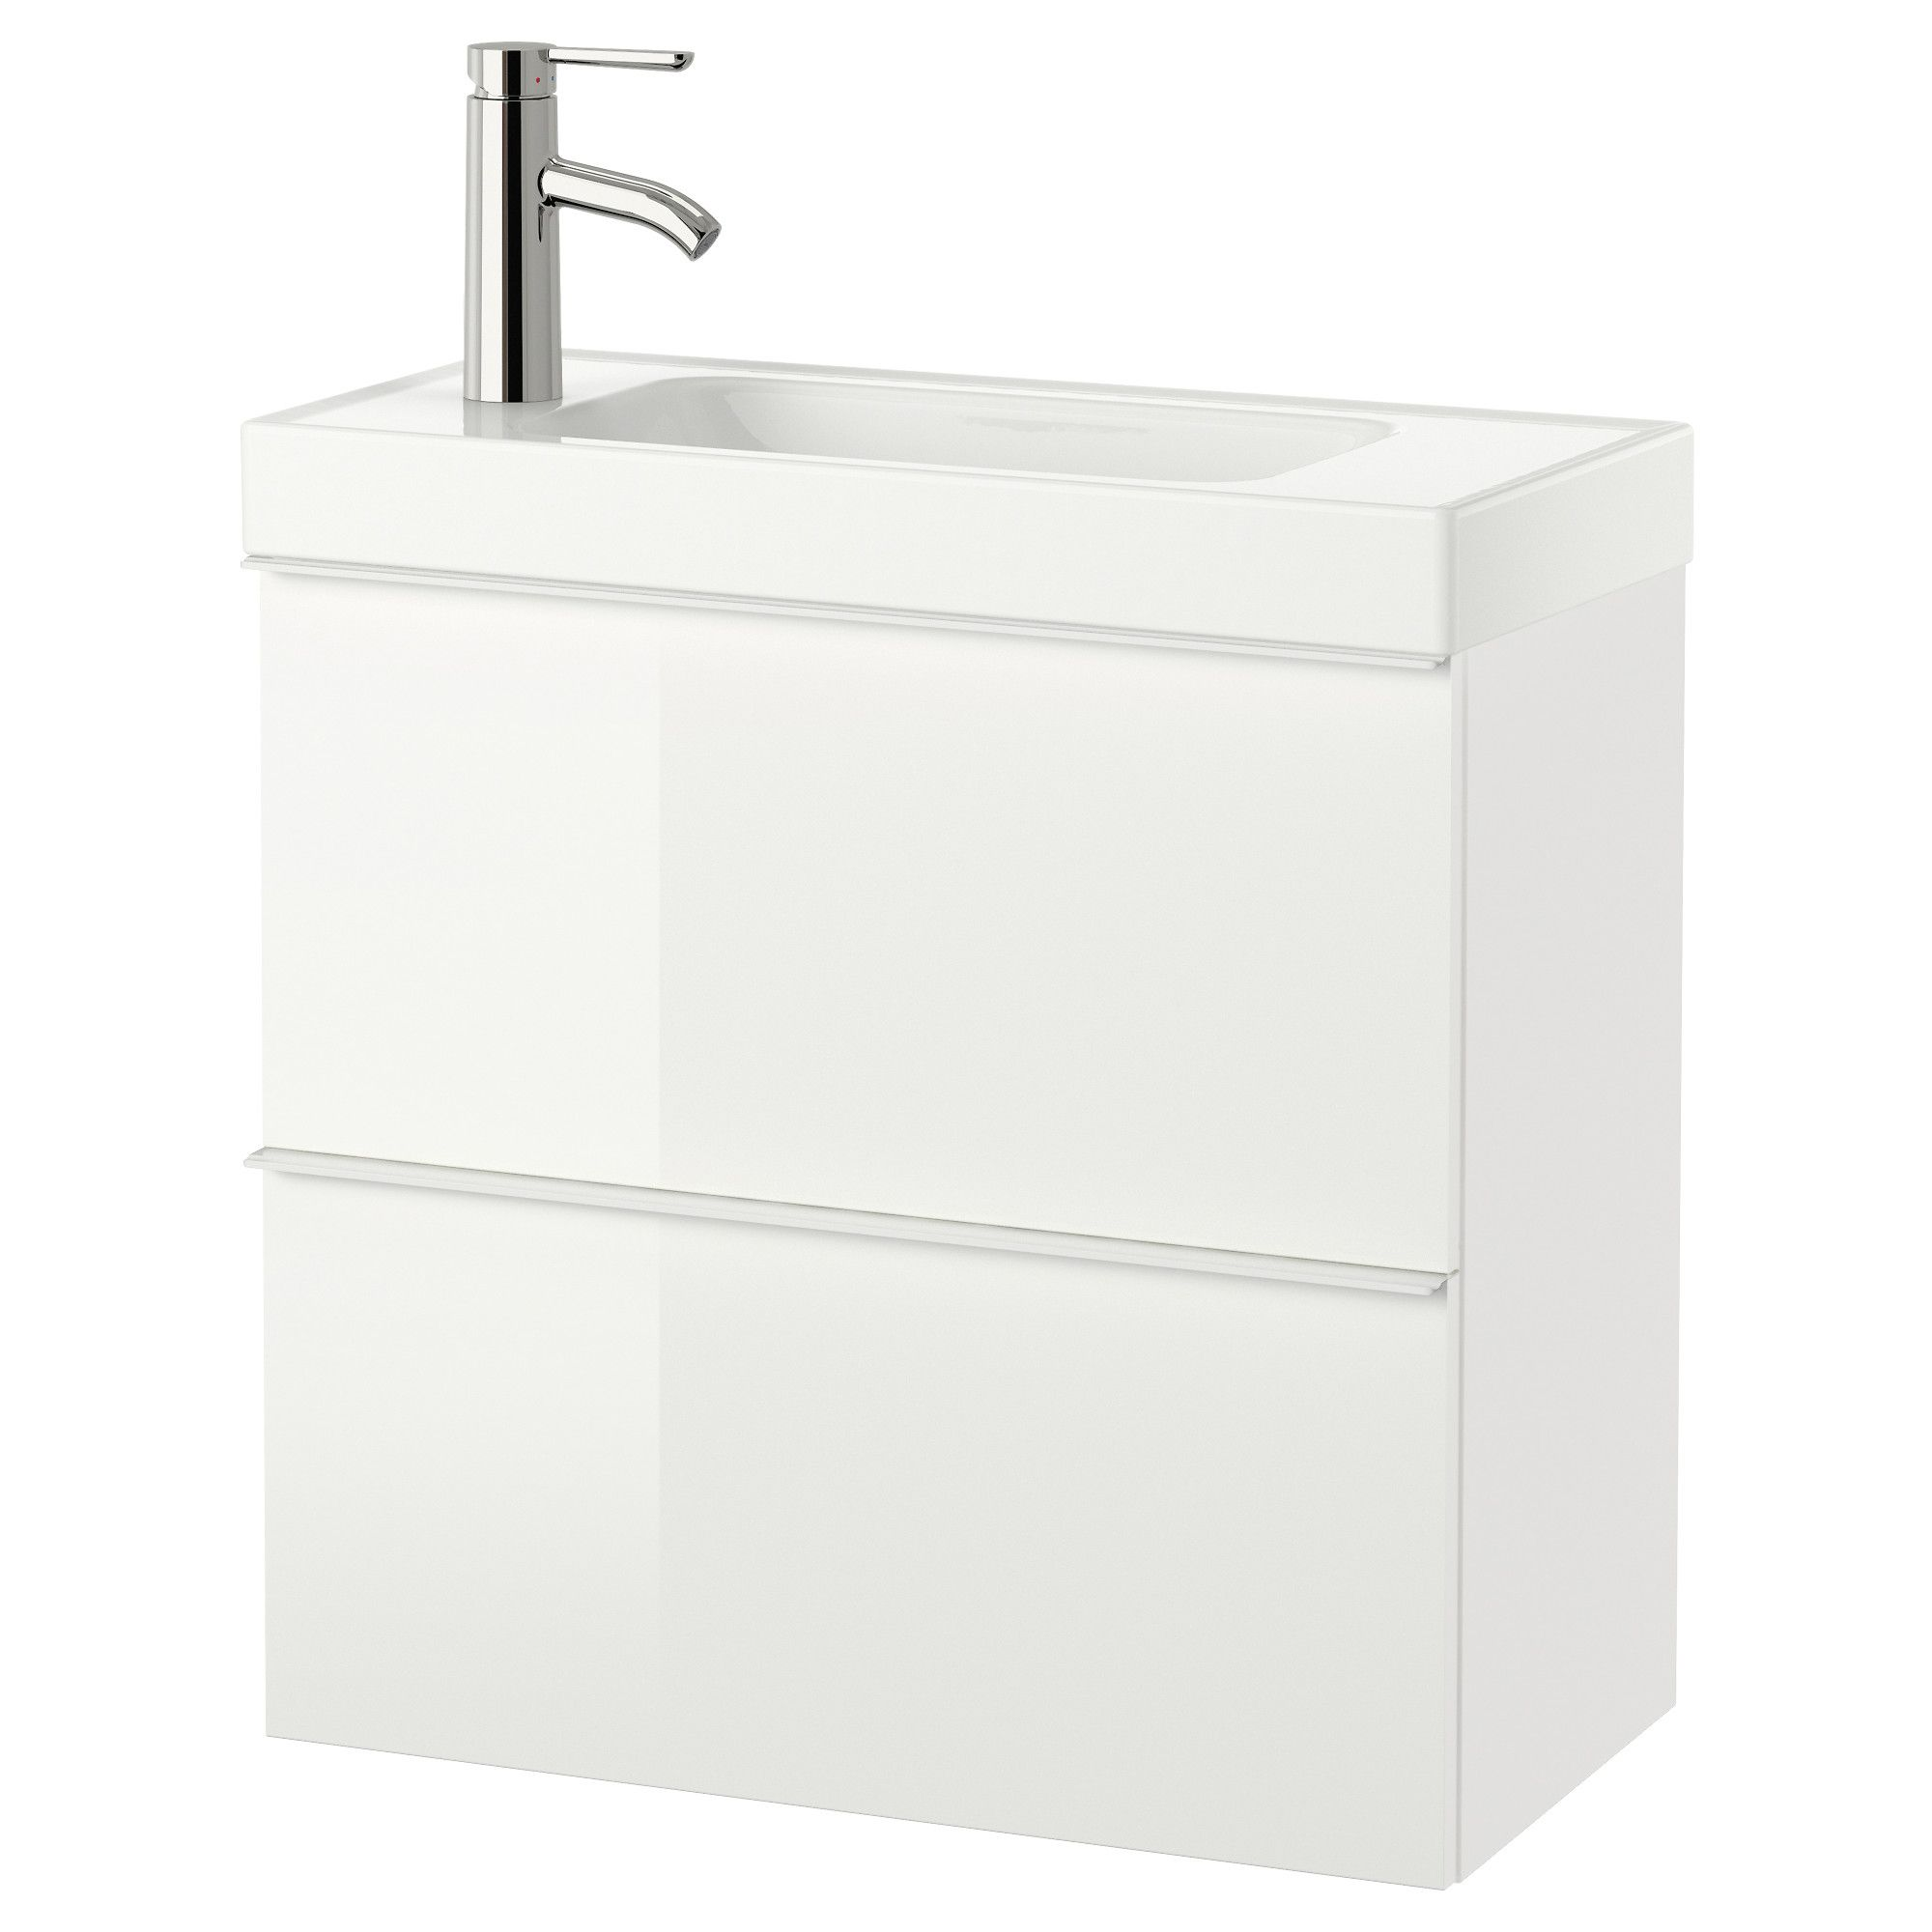 Gypse Vert Salle De Bain ~ ikea godmorgon br viken meuble lavabo 2tir garantie 10 ans